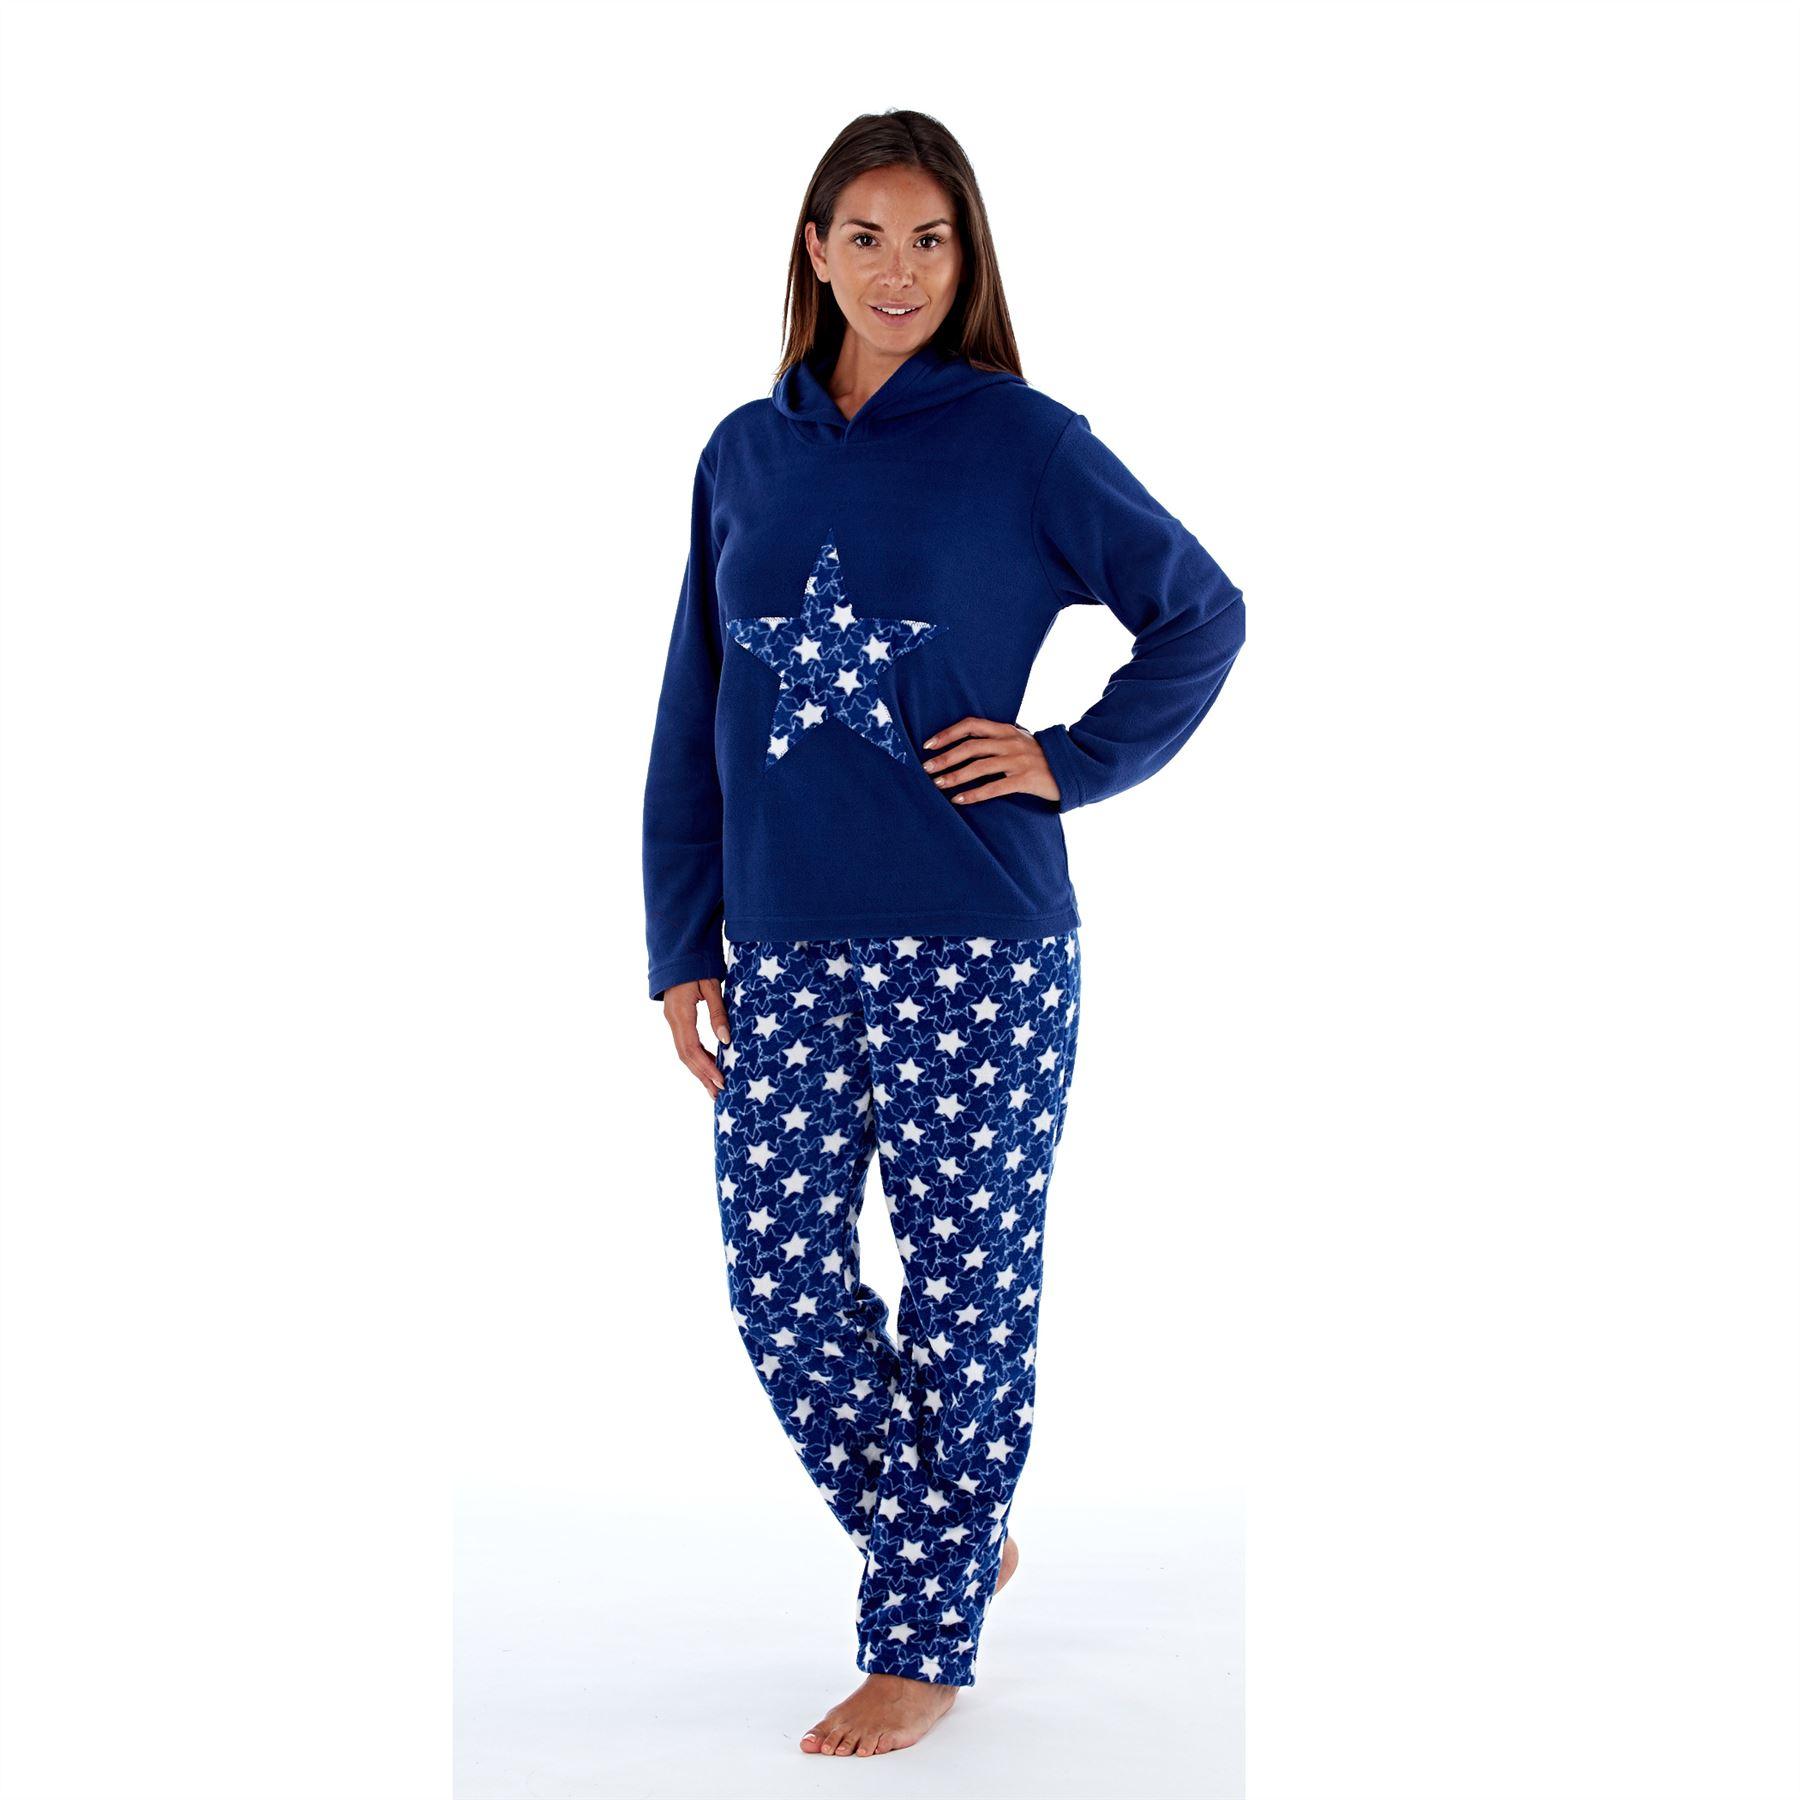 Womens-Ladies-Fleece-Thermal-Pyjamas-Pyjama-PJs-Winter-Nightwear-Set-Size-8-22